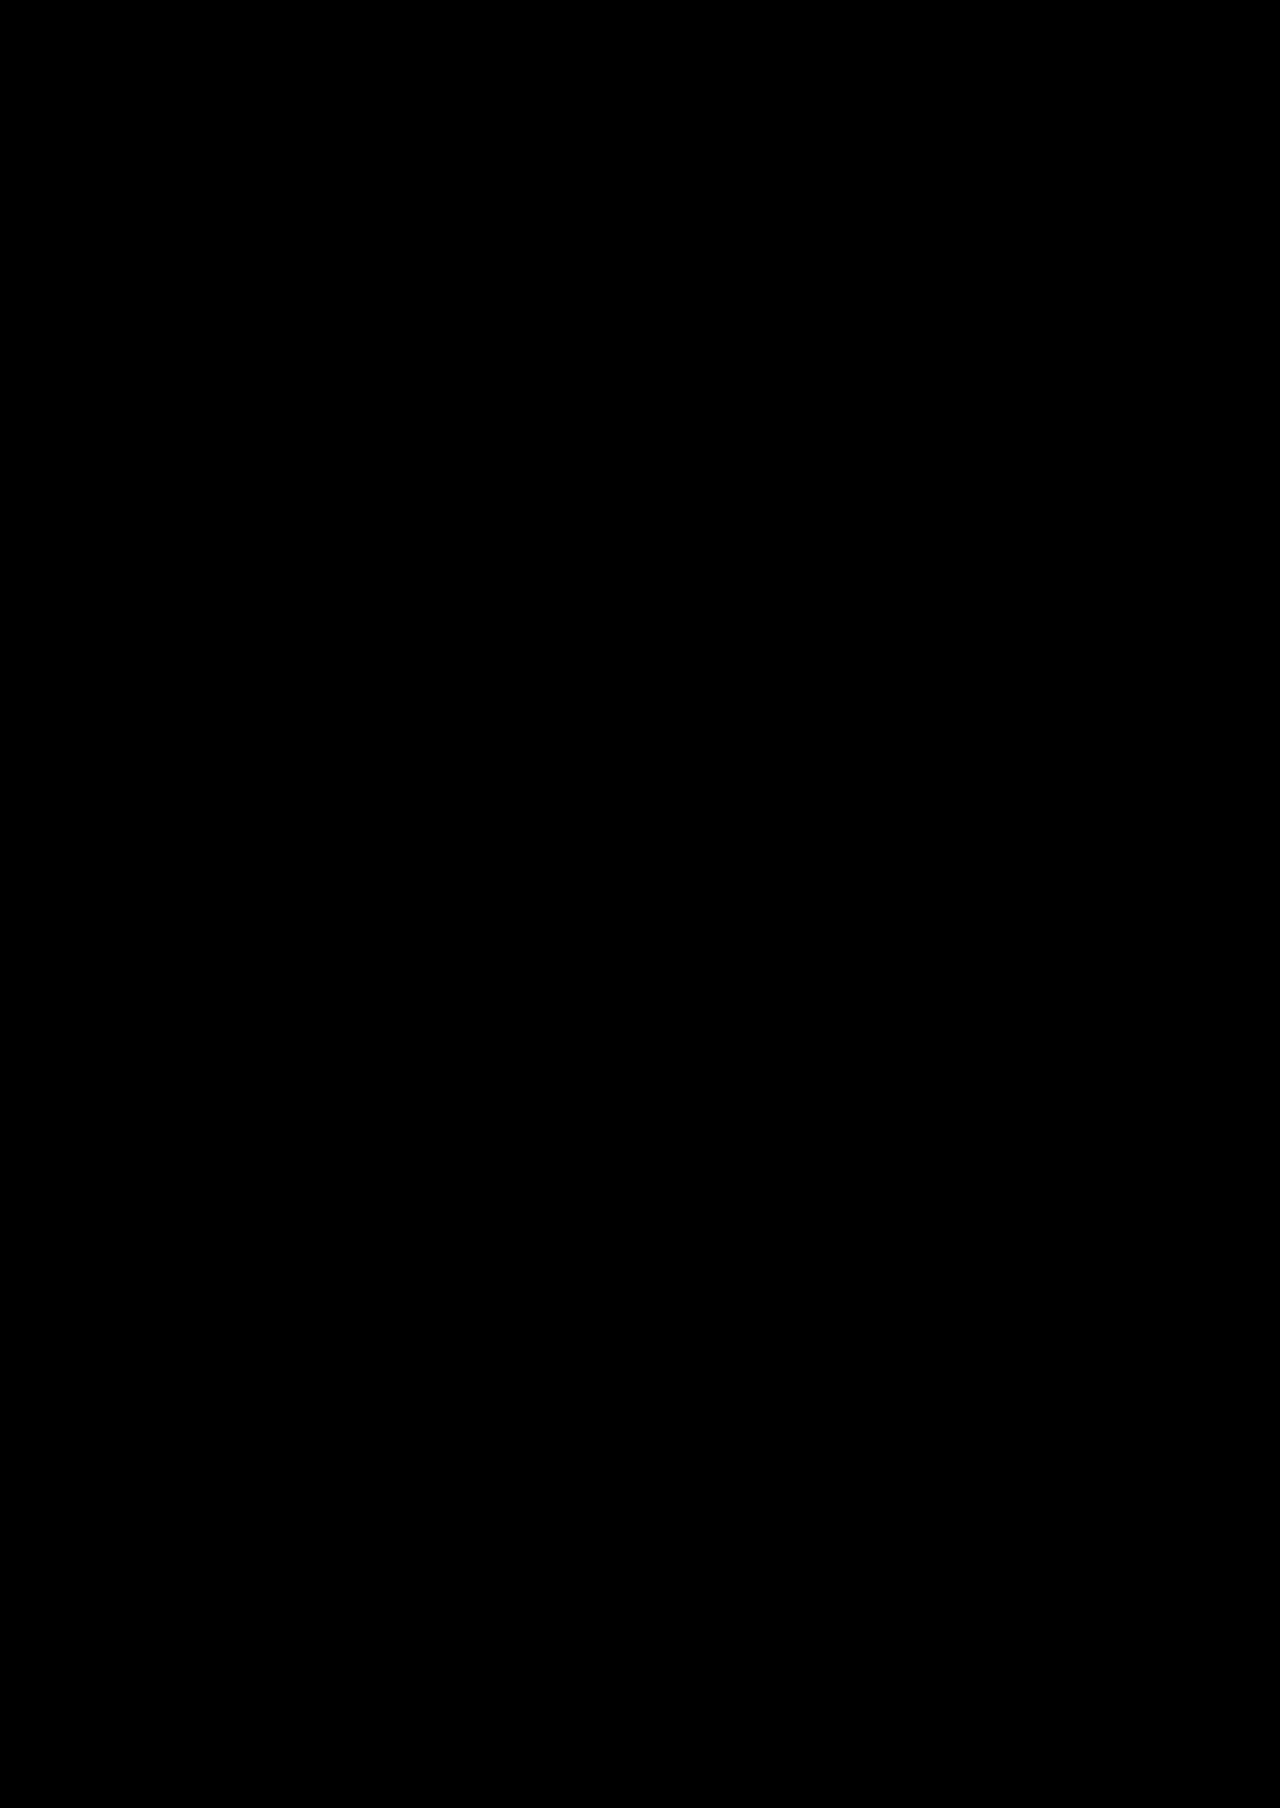 [Tenkirin (Kanroame)] Naritakunai no ni Succubus ni Natte Shimatta Yamada-san | Yamada-san Became a Succubus Against Her Will [English] [EHCOVE] [Digital] 2